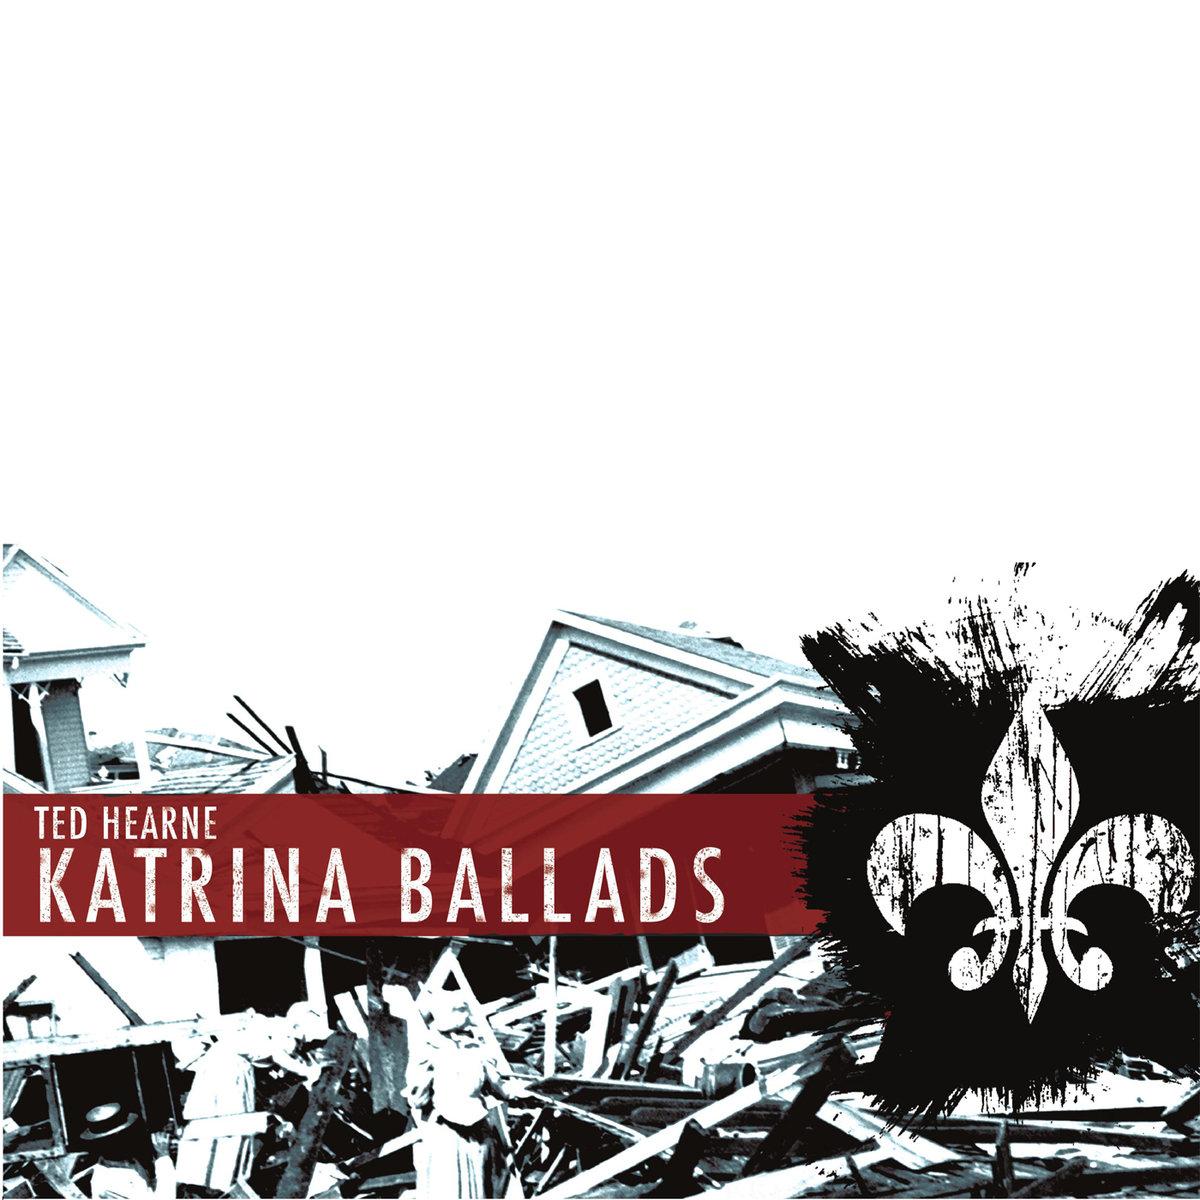 Katrina Ballads